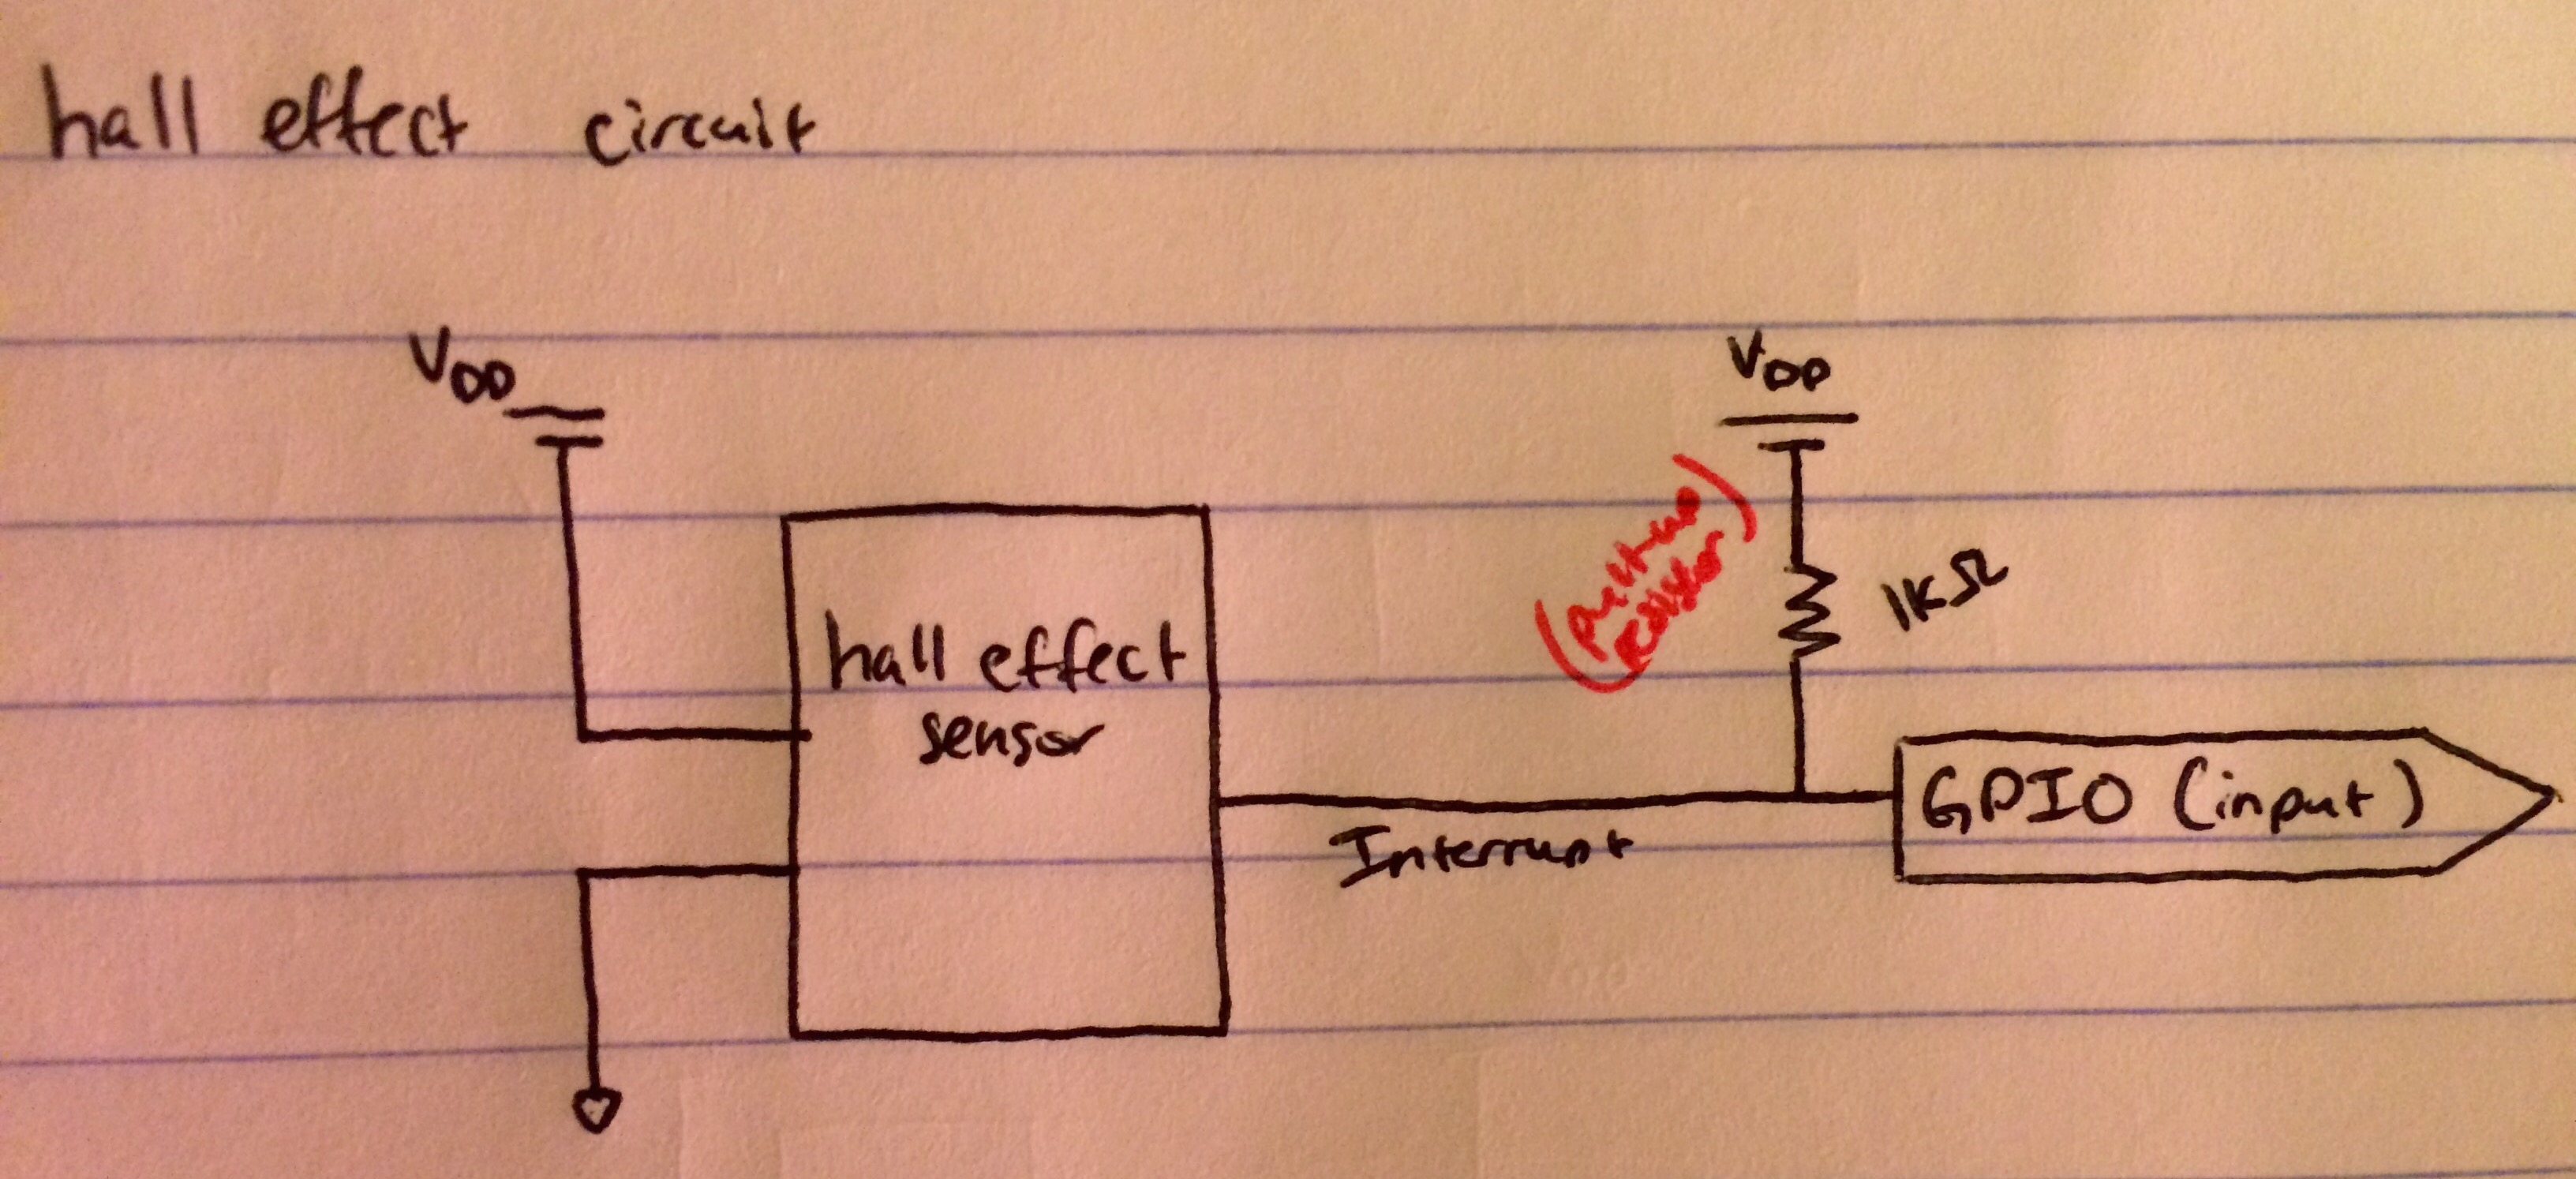 Terrence Kuo Hall Effect Sensor Wiring Additionally Circuit